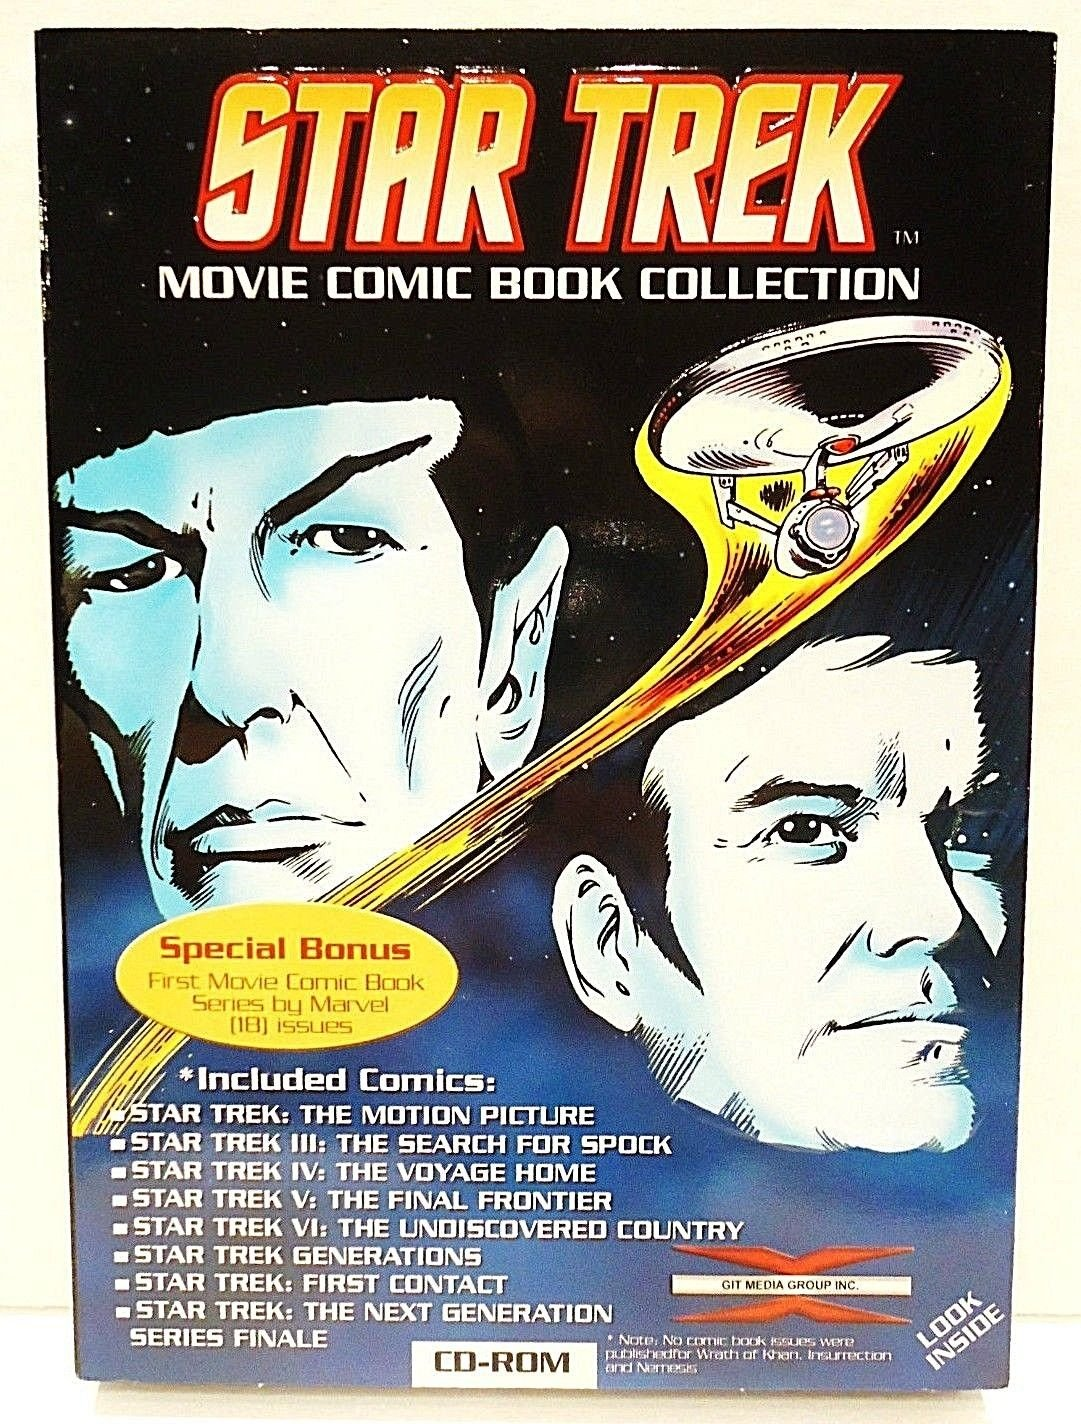 STAR TREK - MOVIE - COMIC - BOOK - COLLECTION - NEW - CD-ROM - PC - MAC - SPOCK